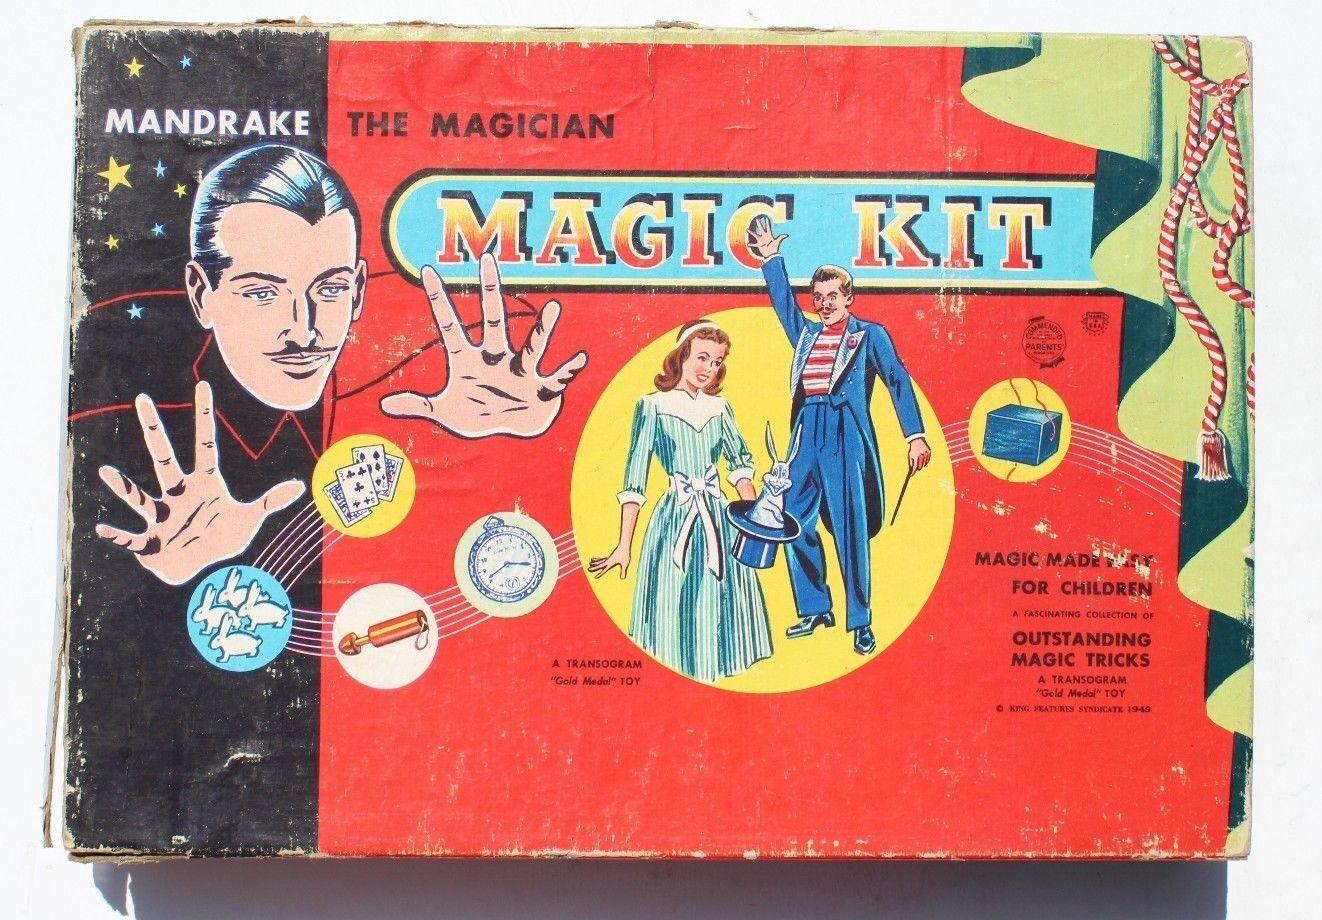 Vintage 1949 Transogram Mandrake the Magician Kit Magic Game Boxed